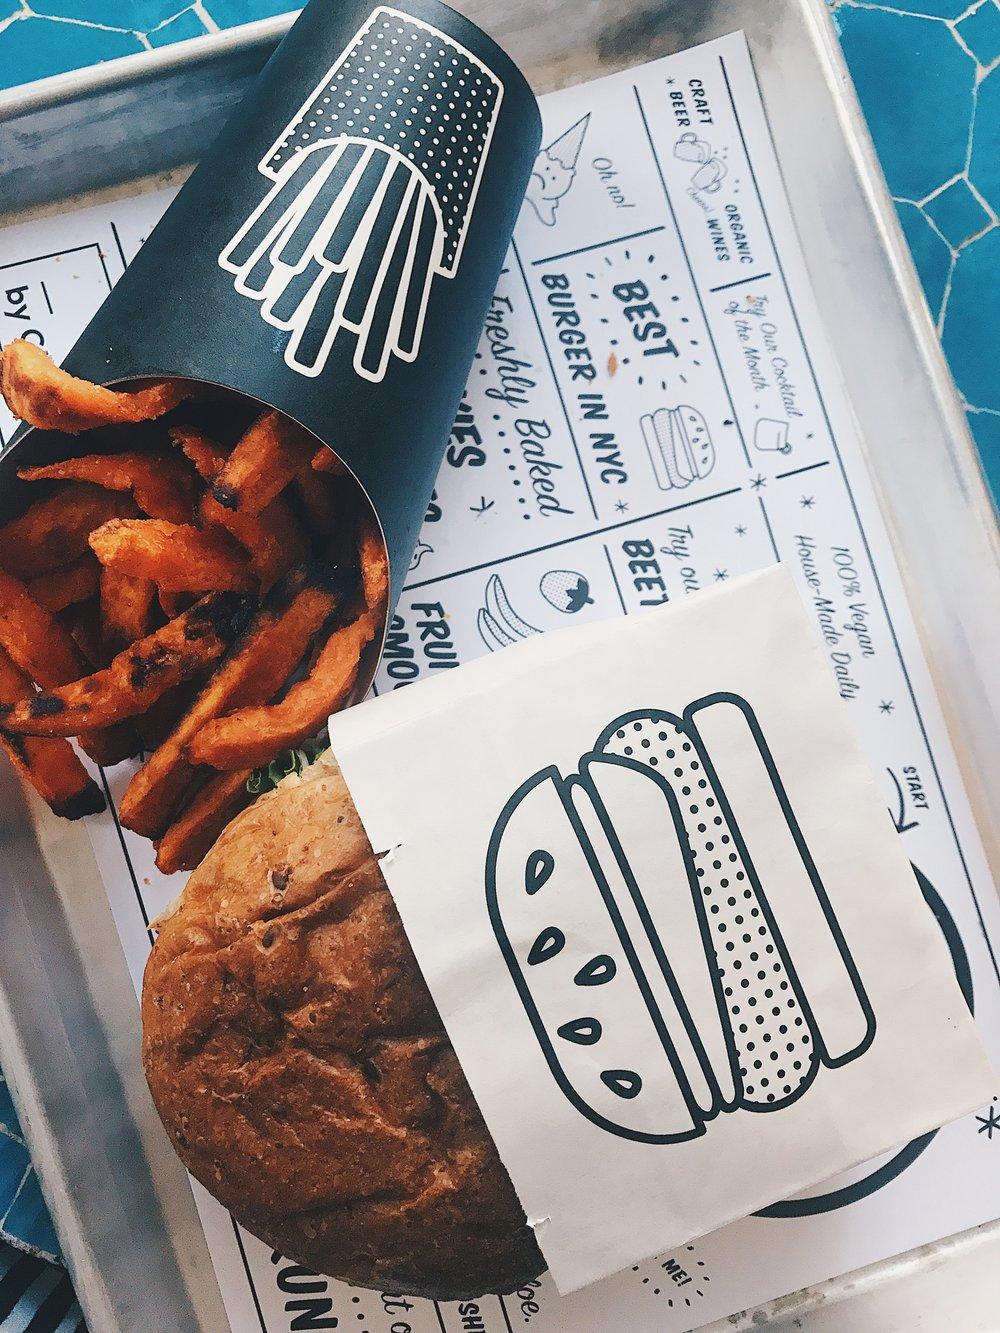 Vegan Burger and Fries!